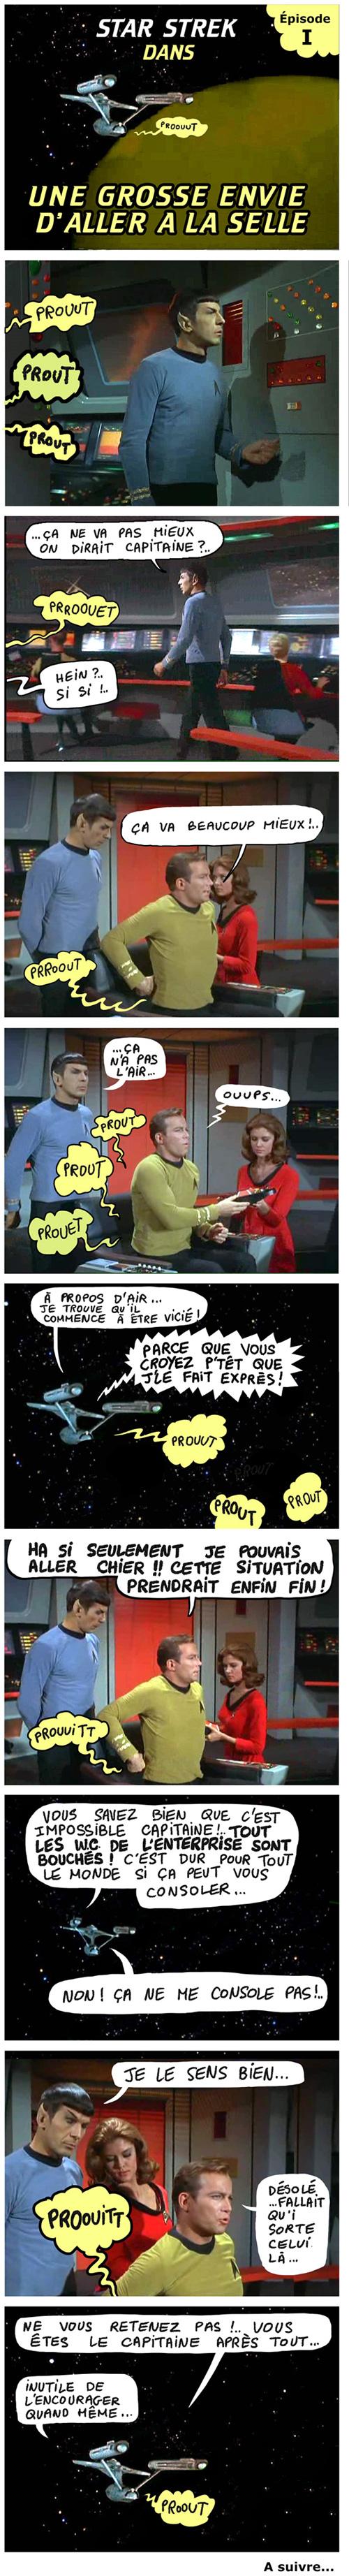 star trek - capitaine kirk fait caca 1